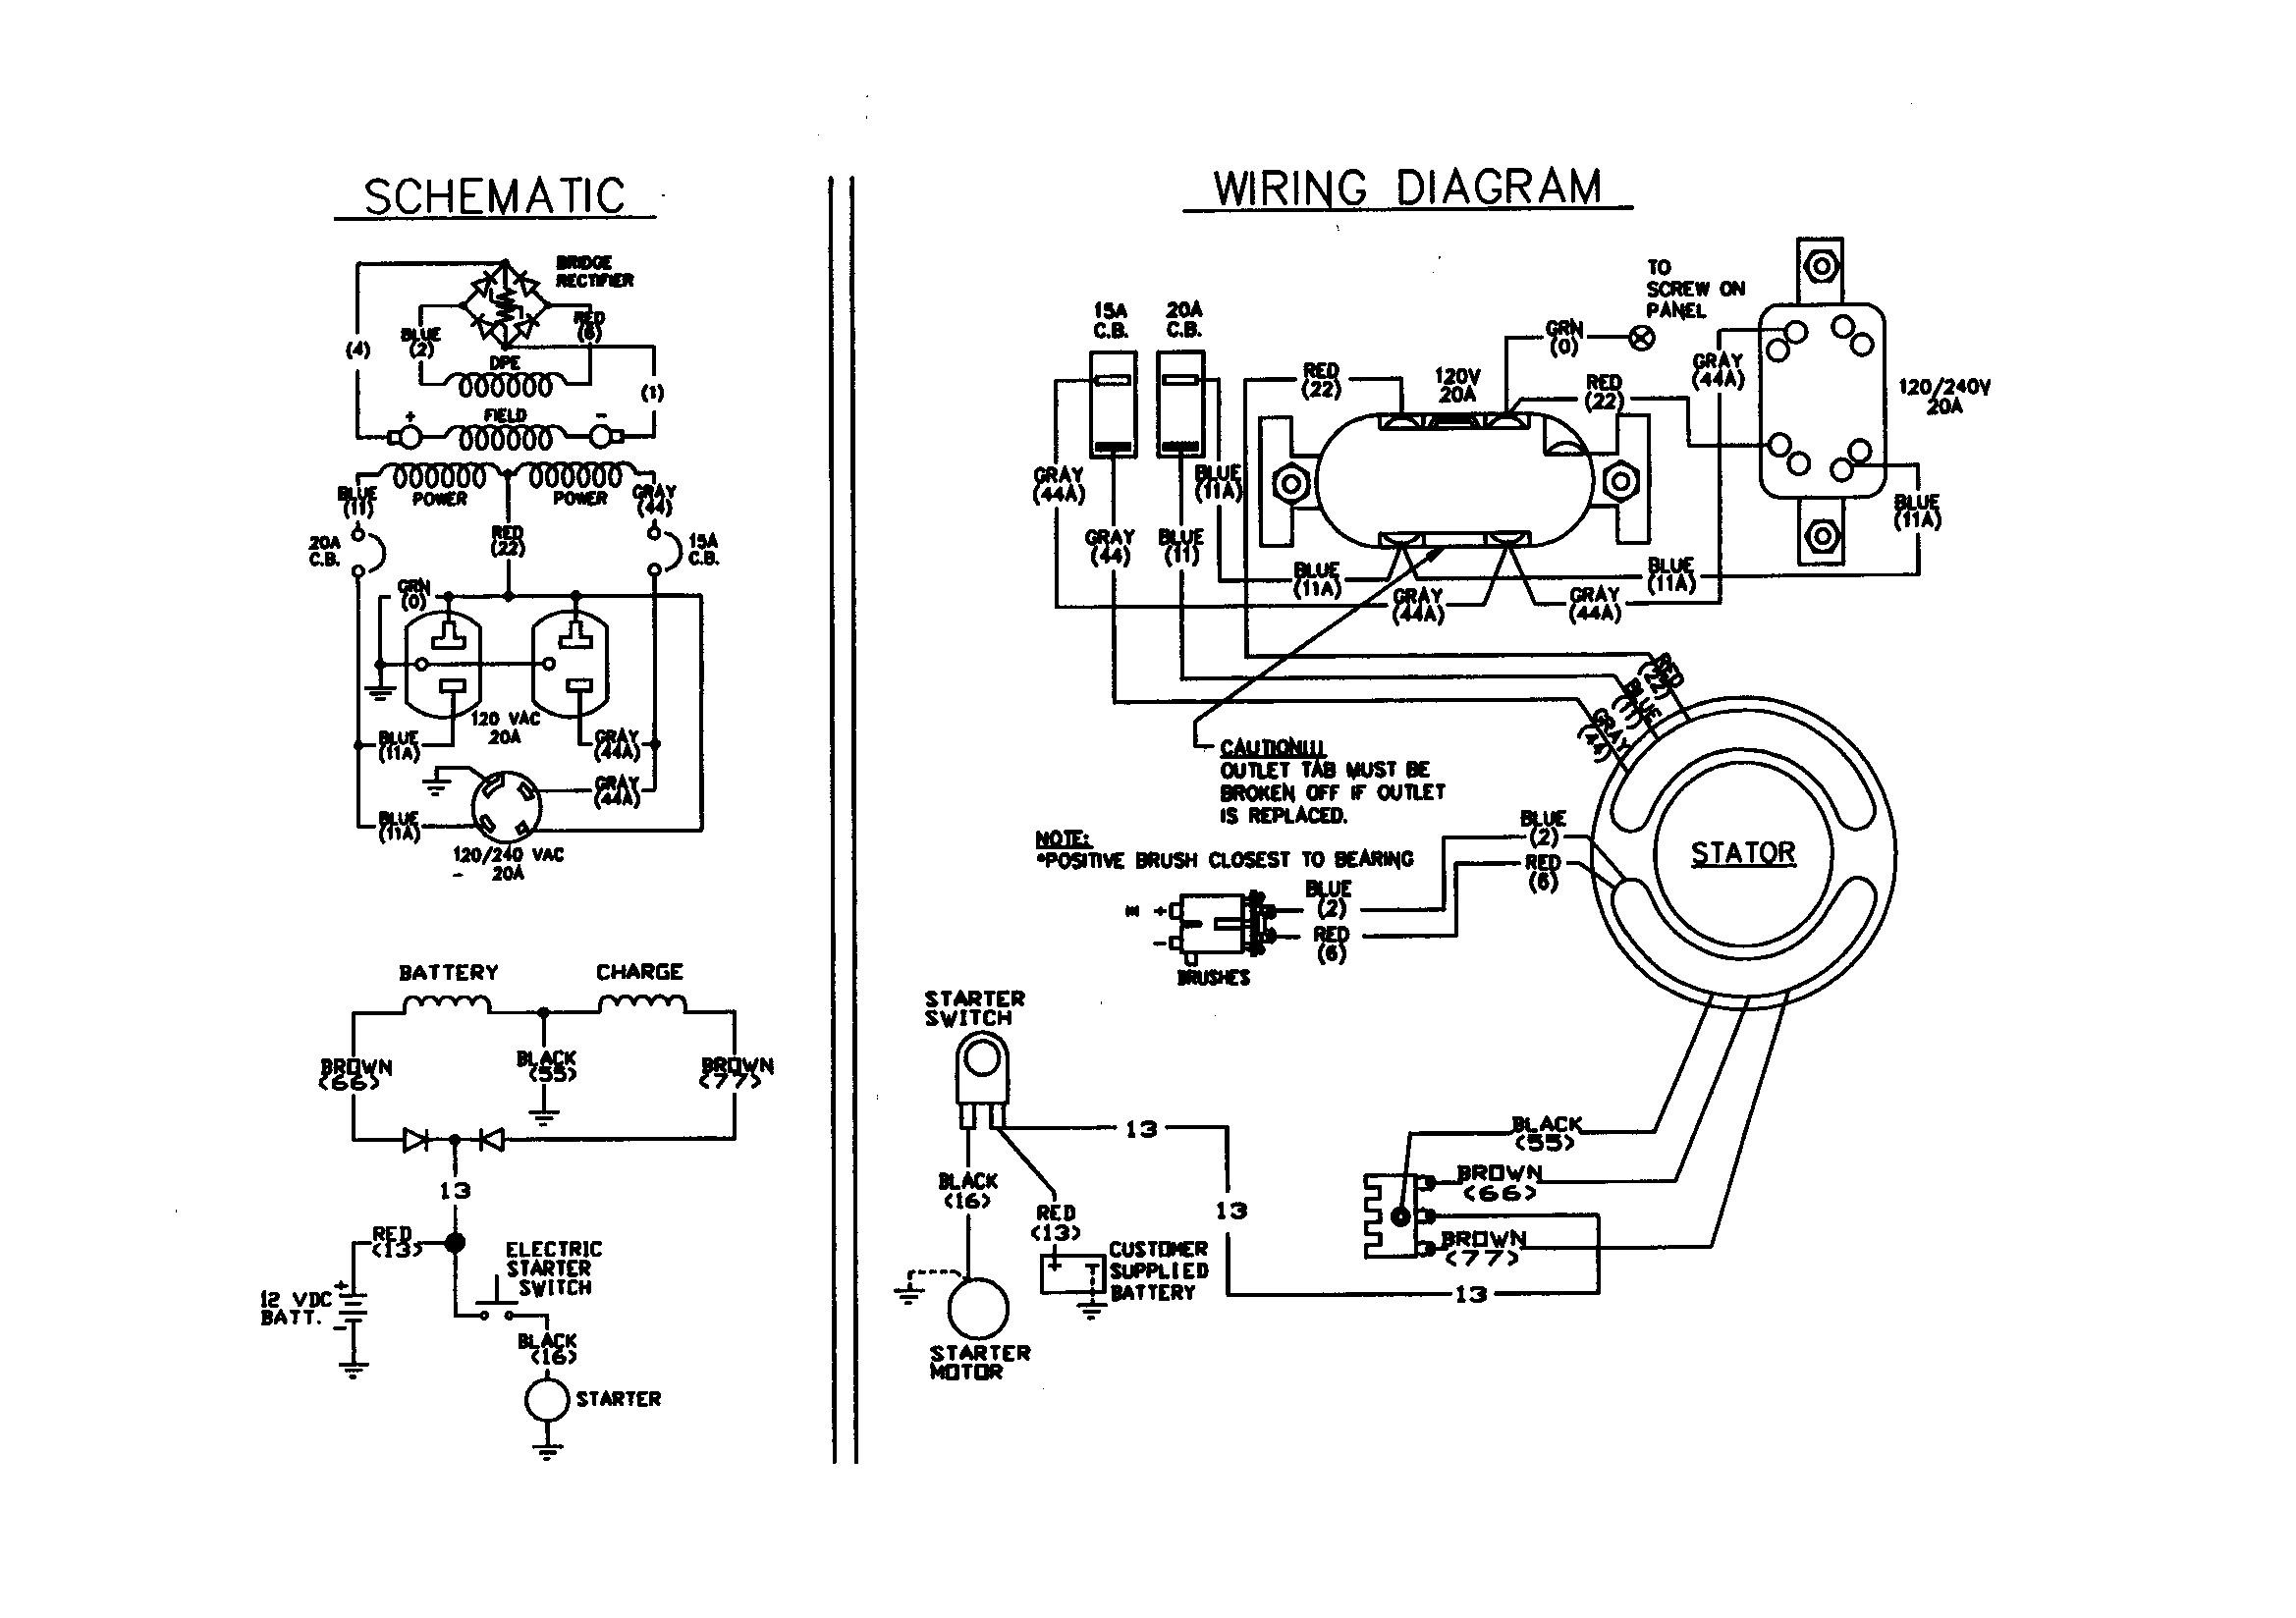 Sensational Dometic Refrigerator Wiring Diagram Wellread Me For Techteazer Com Wiring Cloud Ostrrenstrafr09Org